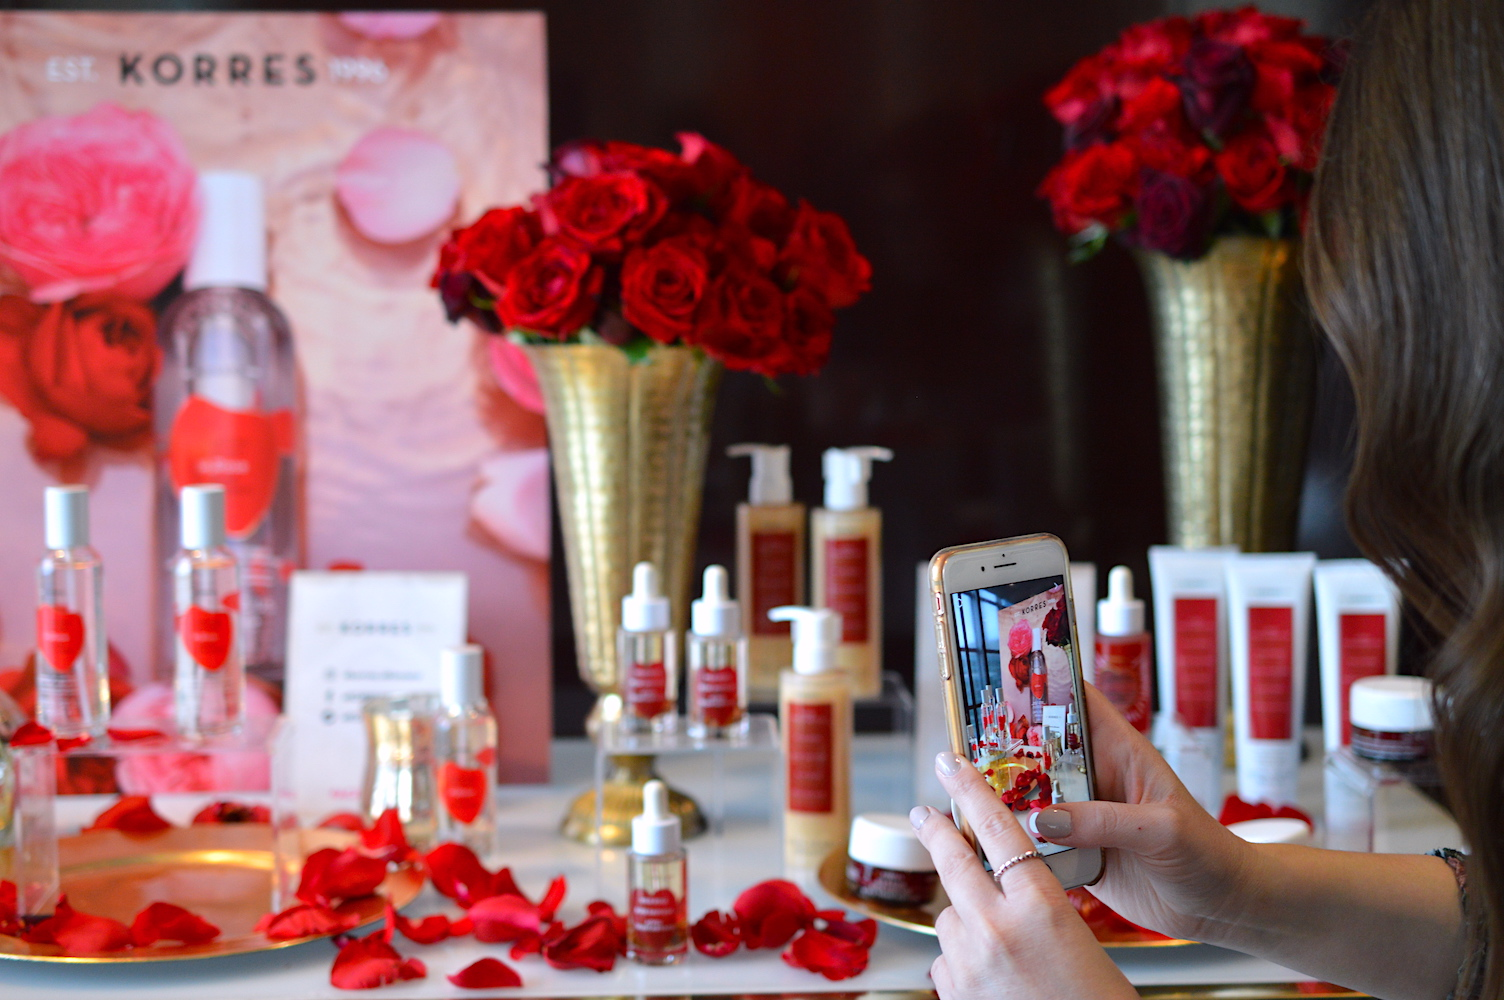 KORRES rose review